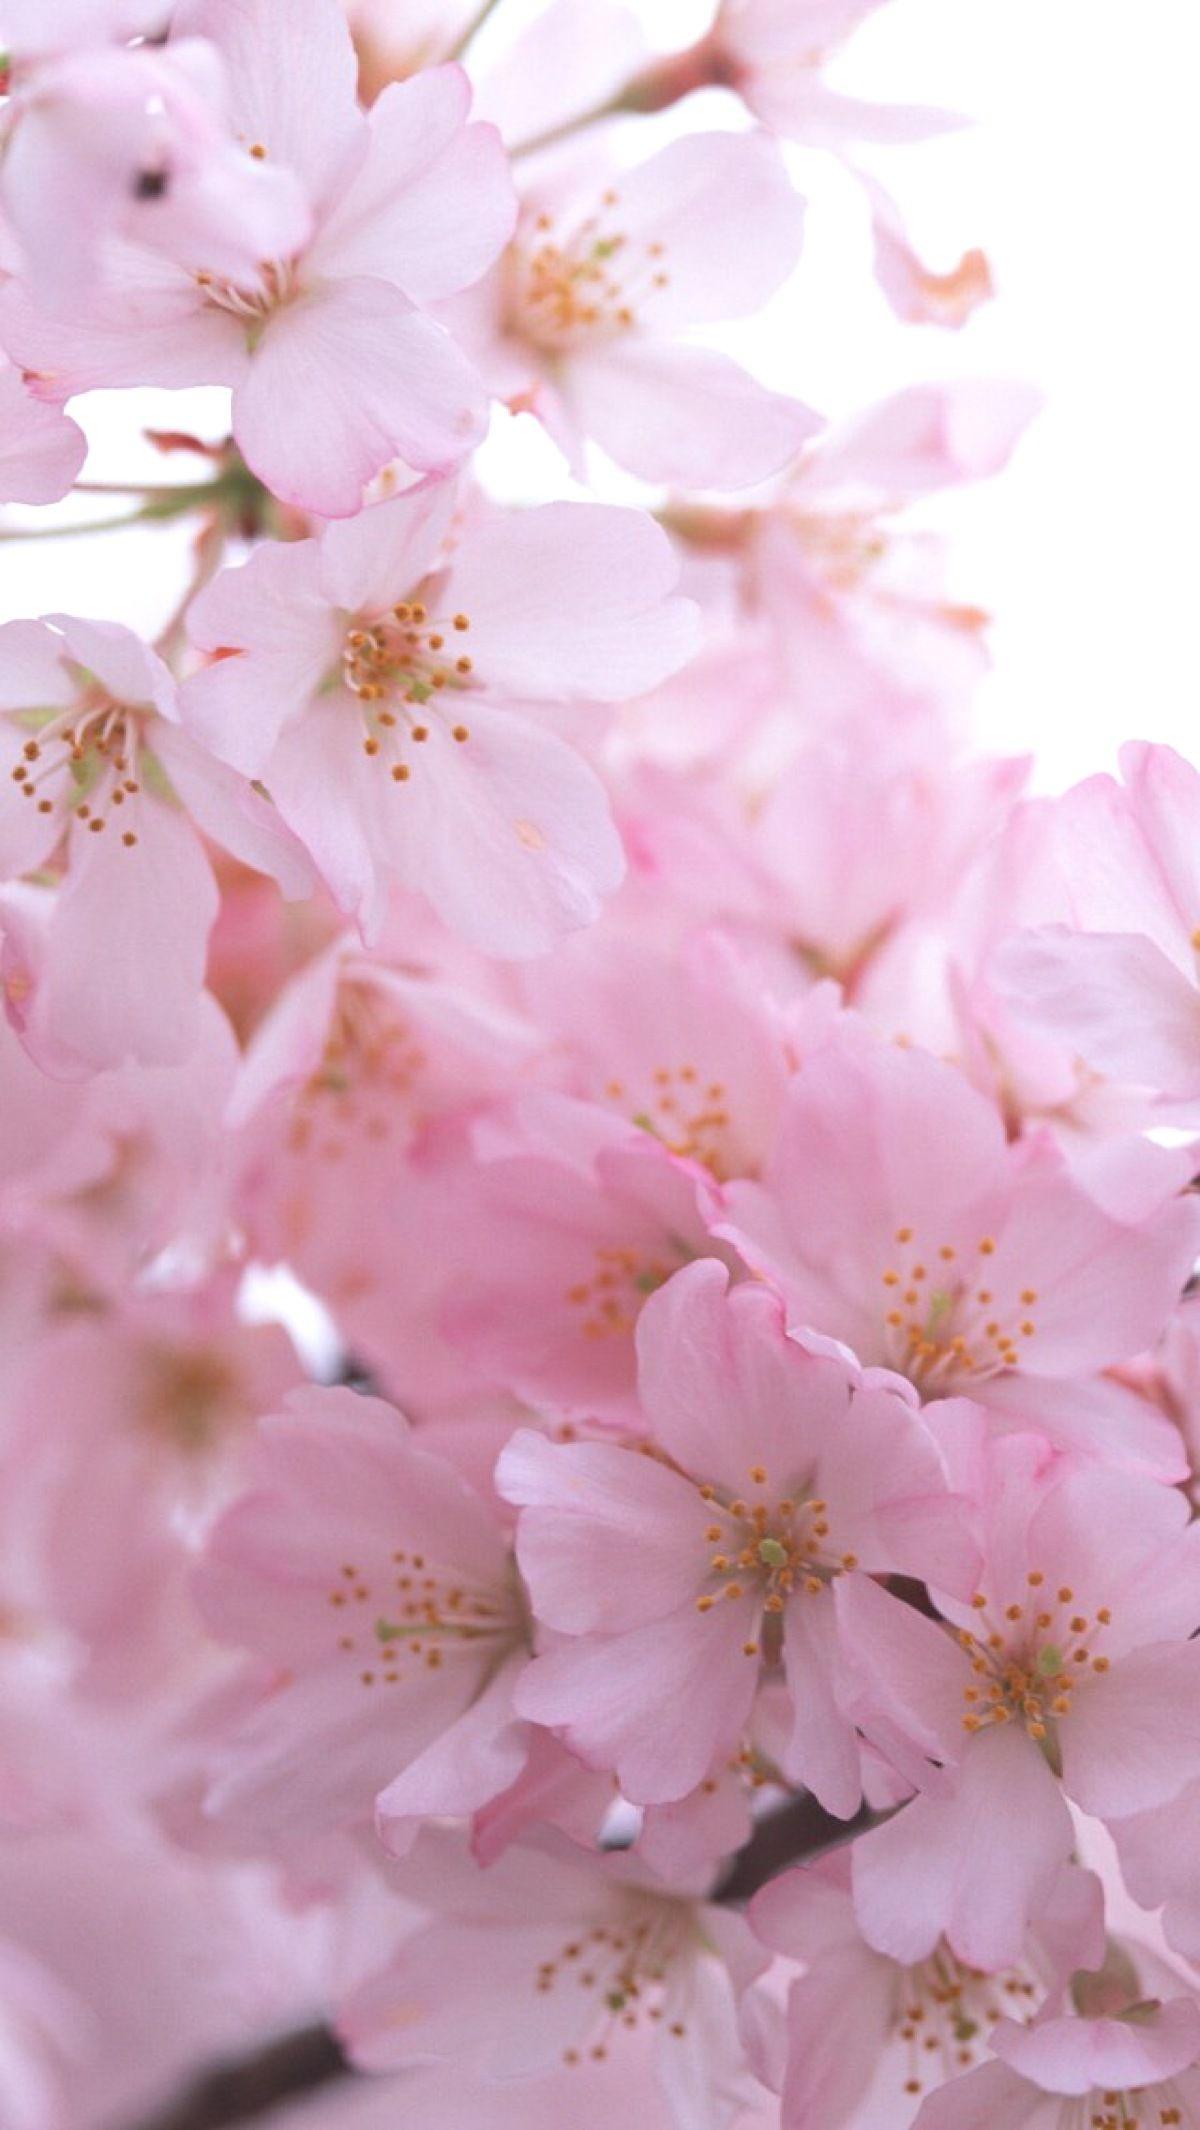 038 flowers pink blossoms pinterest flowers 038 flowers pink mightylinksfo